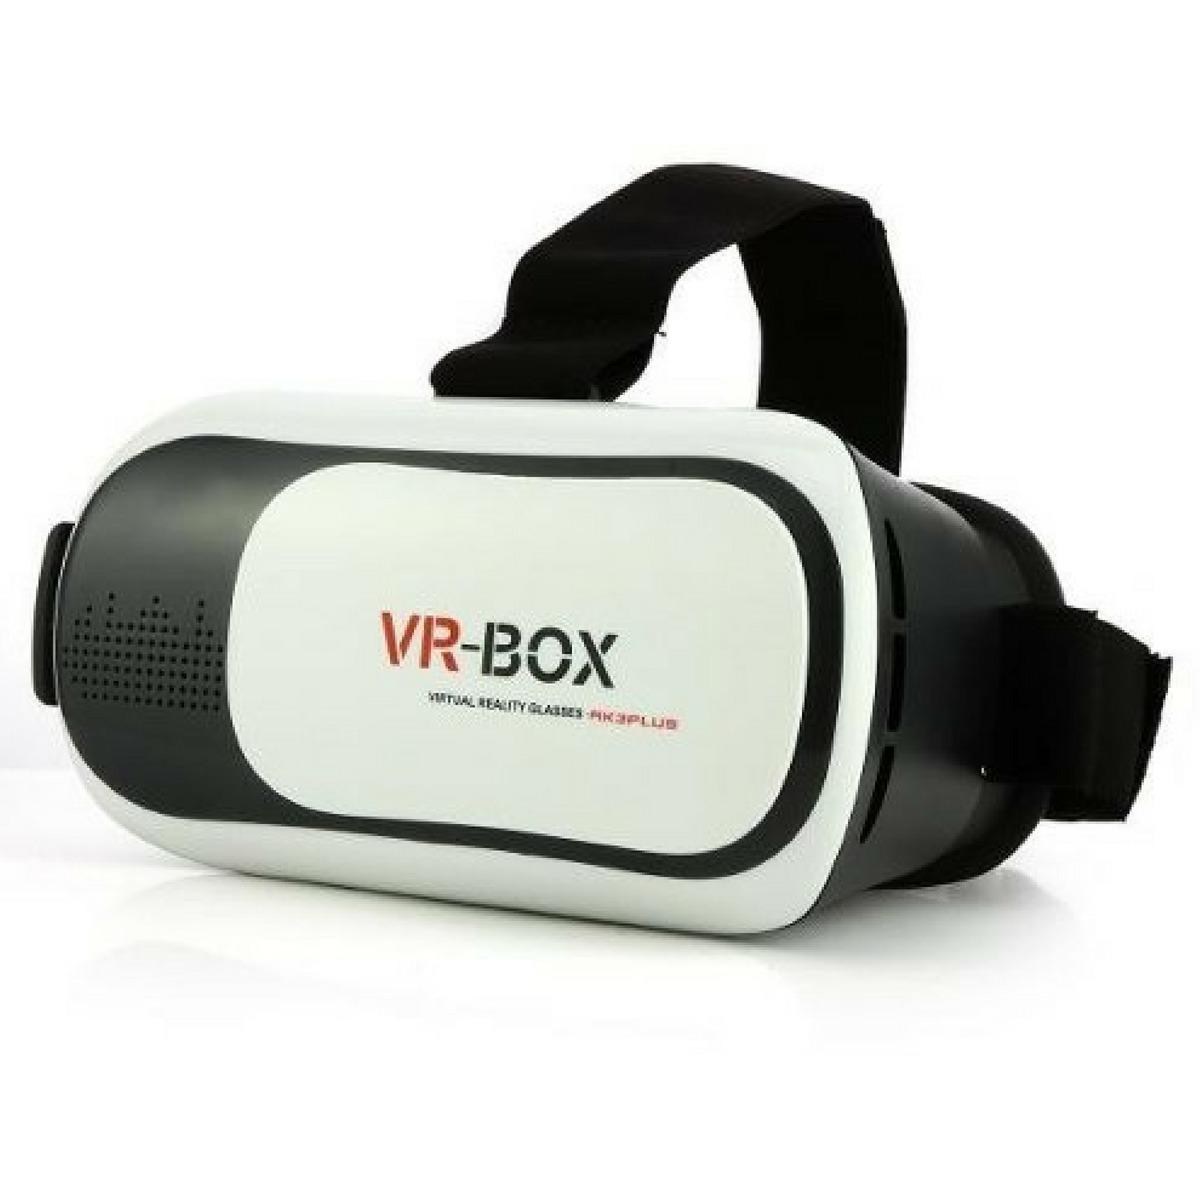 82b3c439d 2 óculos realidade virtual vr box video filme smartphone ios. Carregando  zoom.